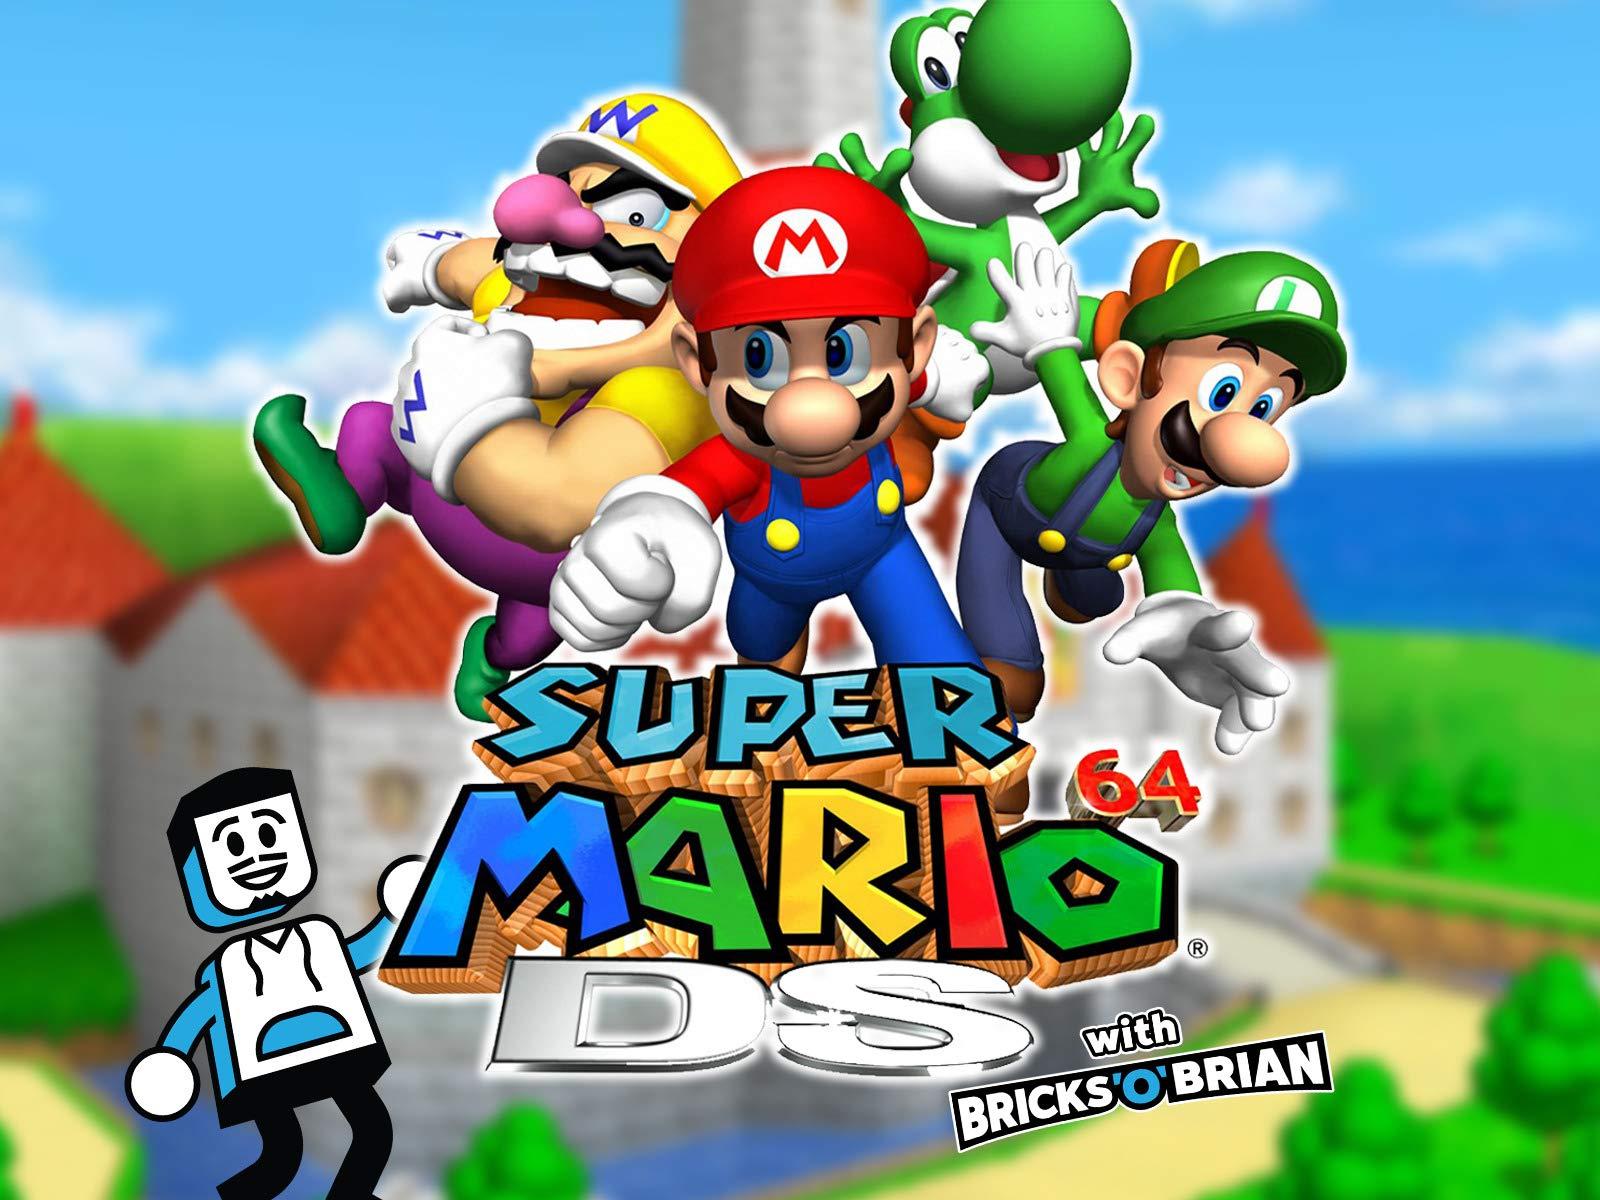 Clip: Super Mario 64 DS with Bricks 'O' Brian! - Season 1